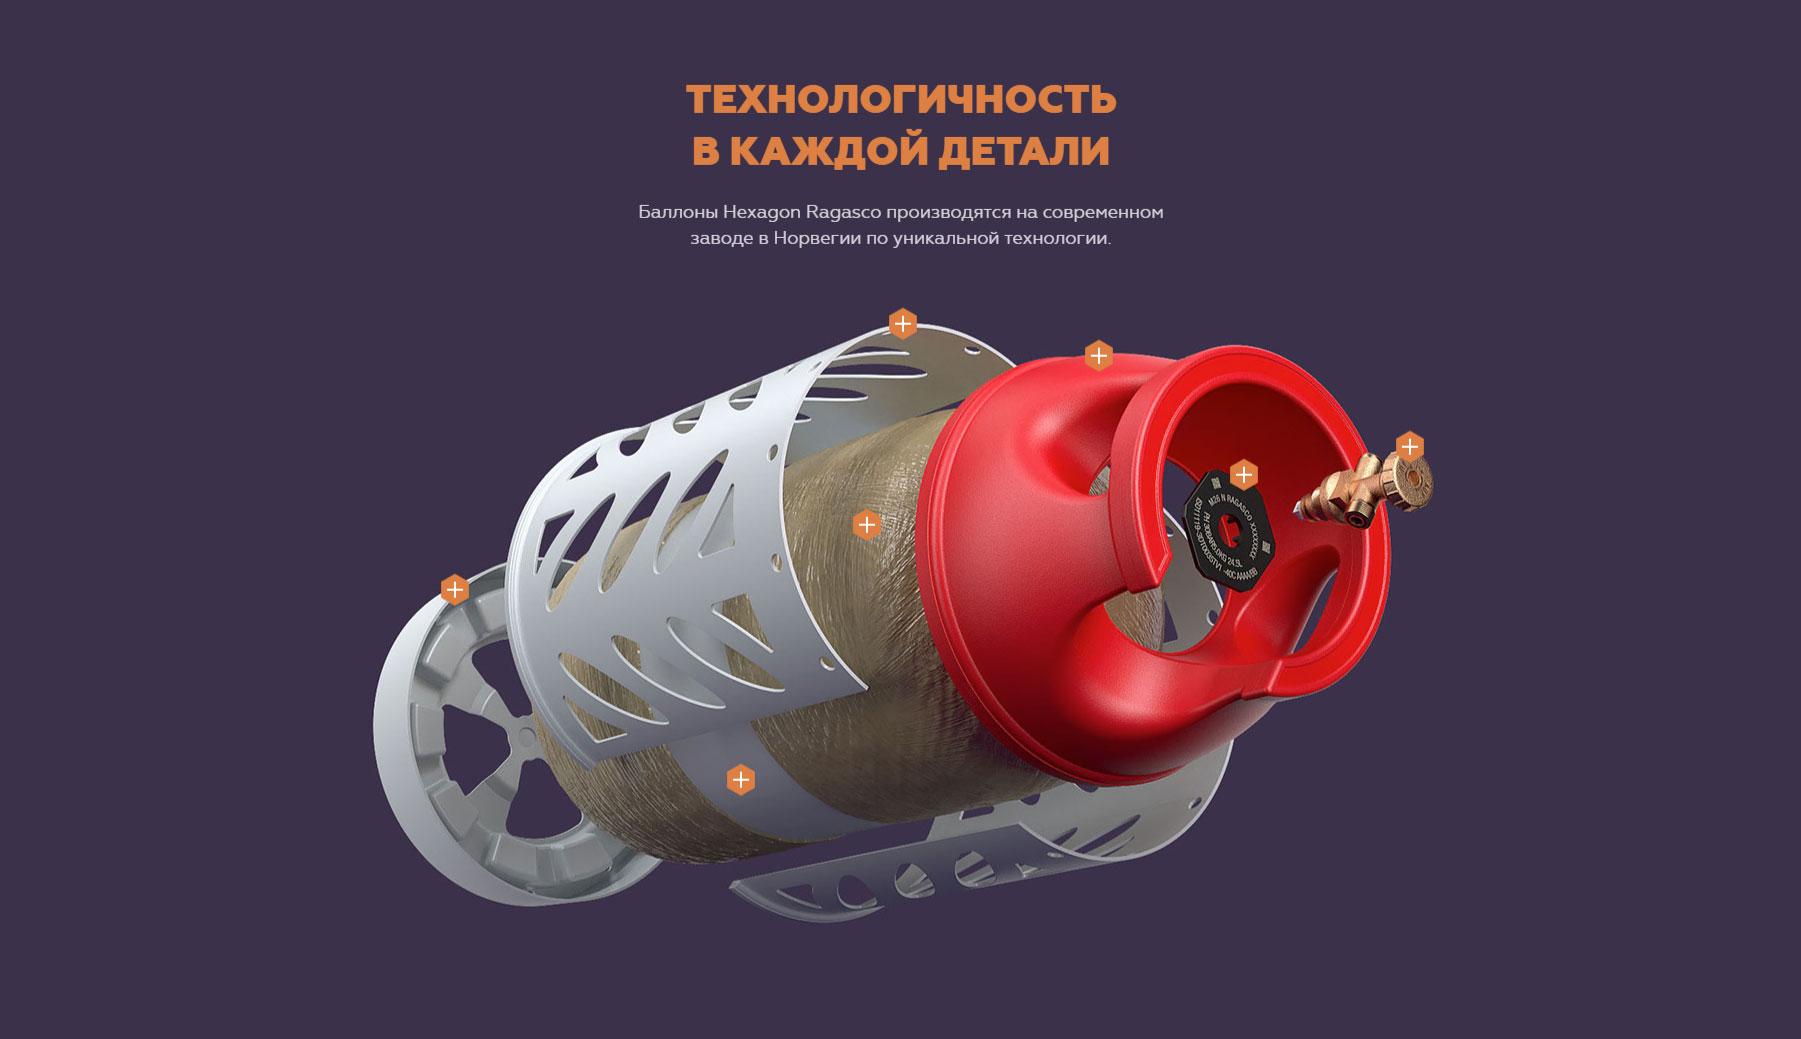 Hexagon Ragasco LPG Cyllinders - Website of the Day